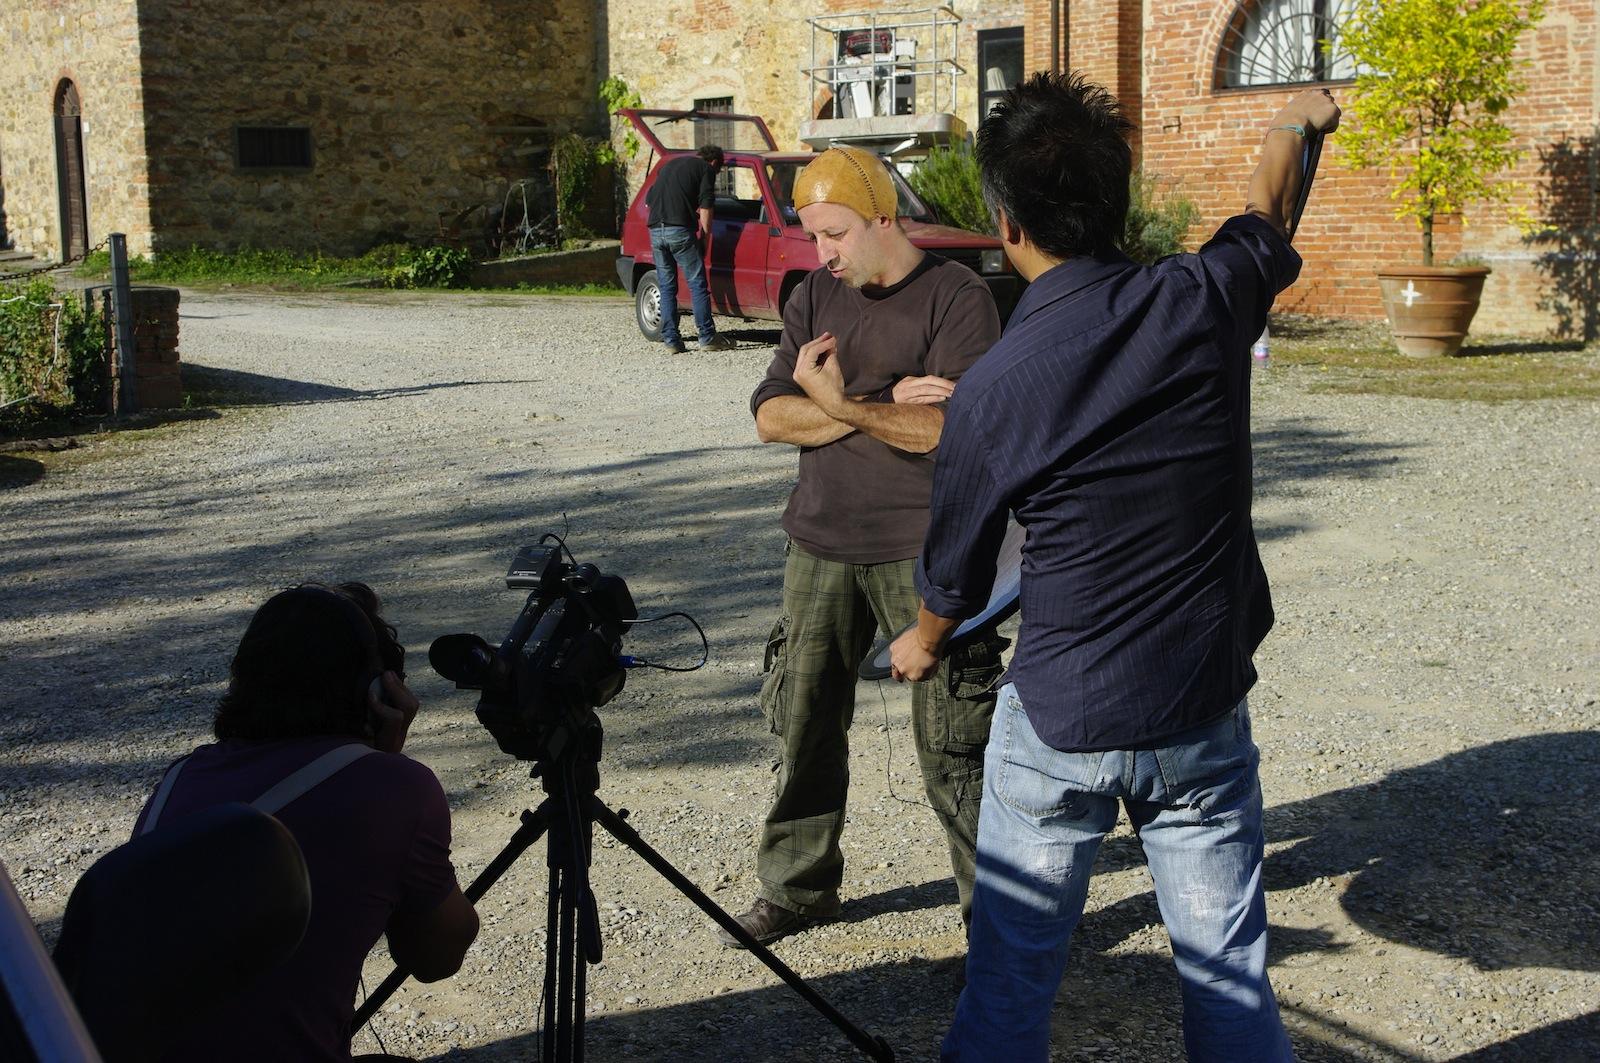 Tayu Vlietstra, Scansioni celesti, 2010